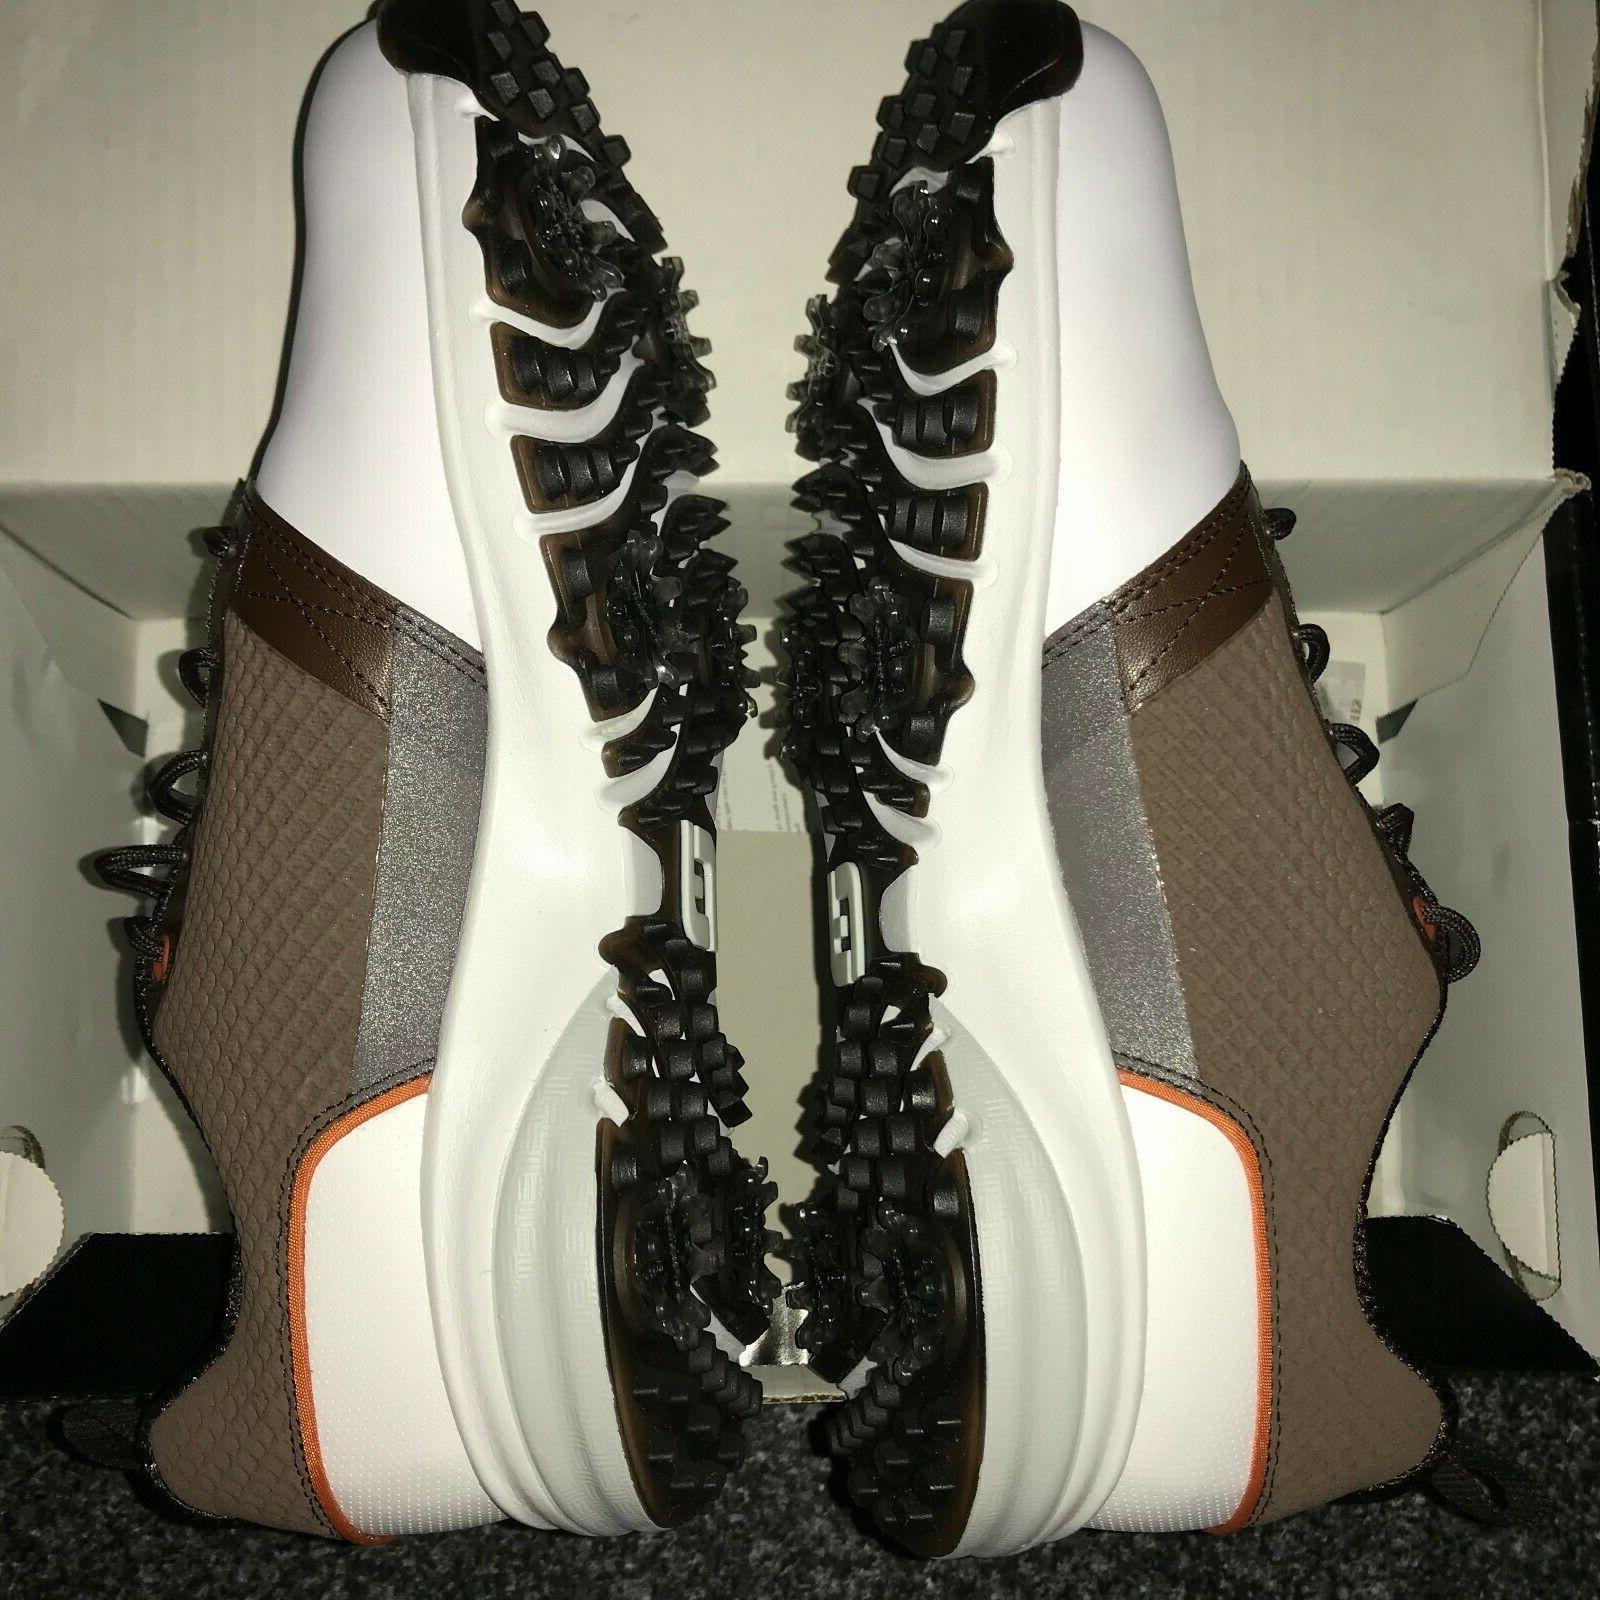 FootJoy Contour Golf Shoes White/Brown 8, 9, 9.5, 10, 10.5,